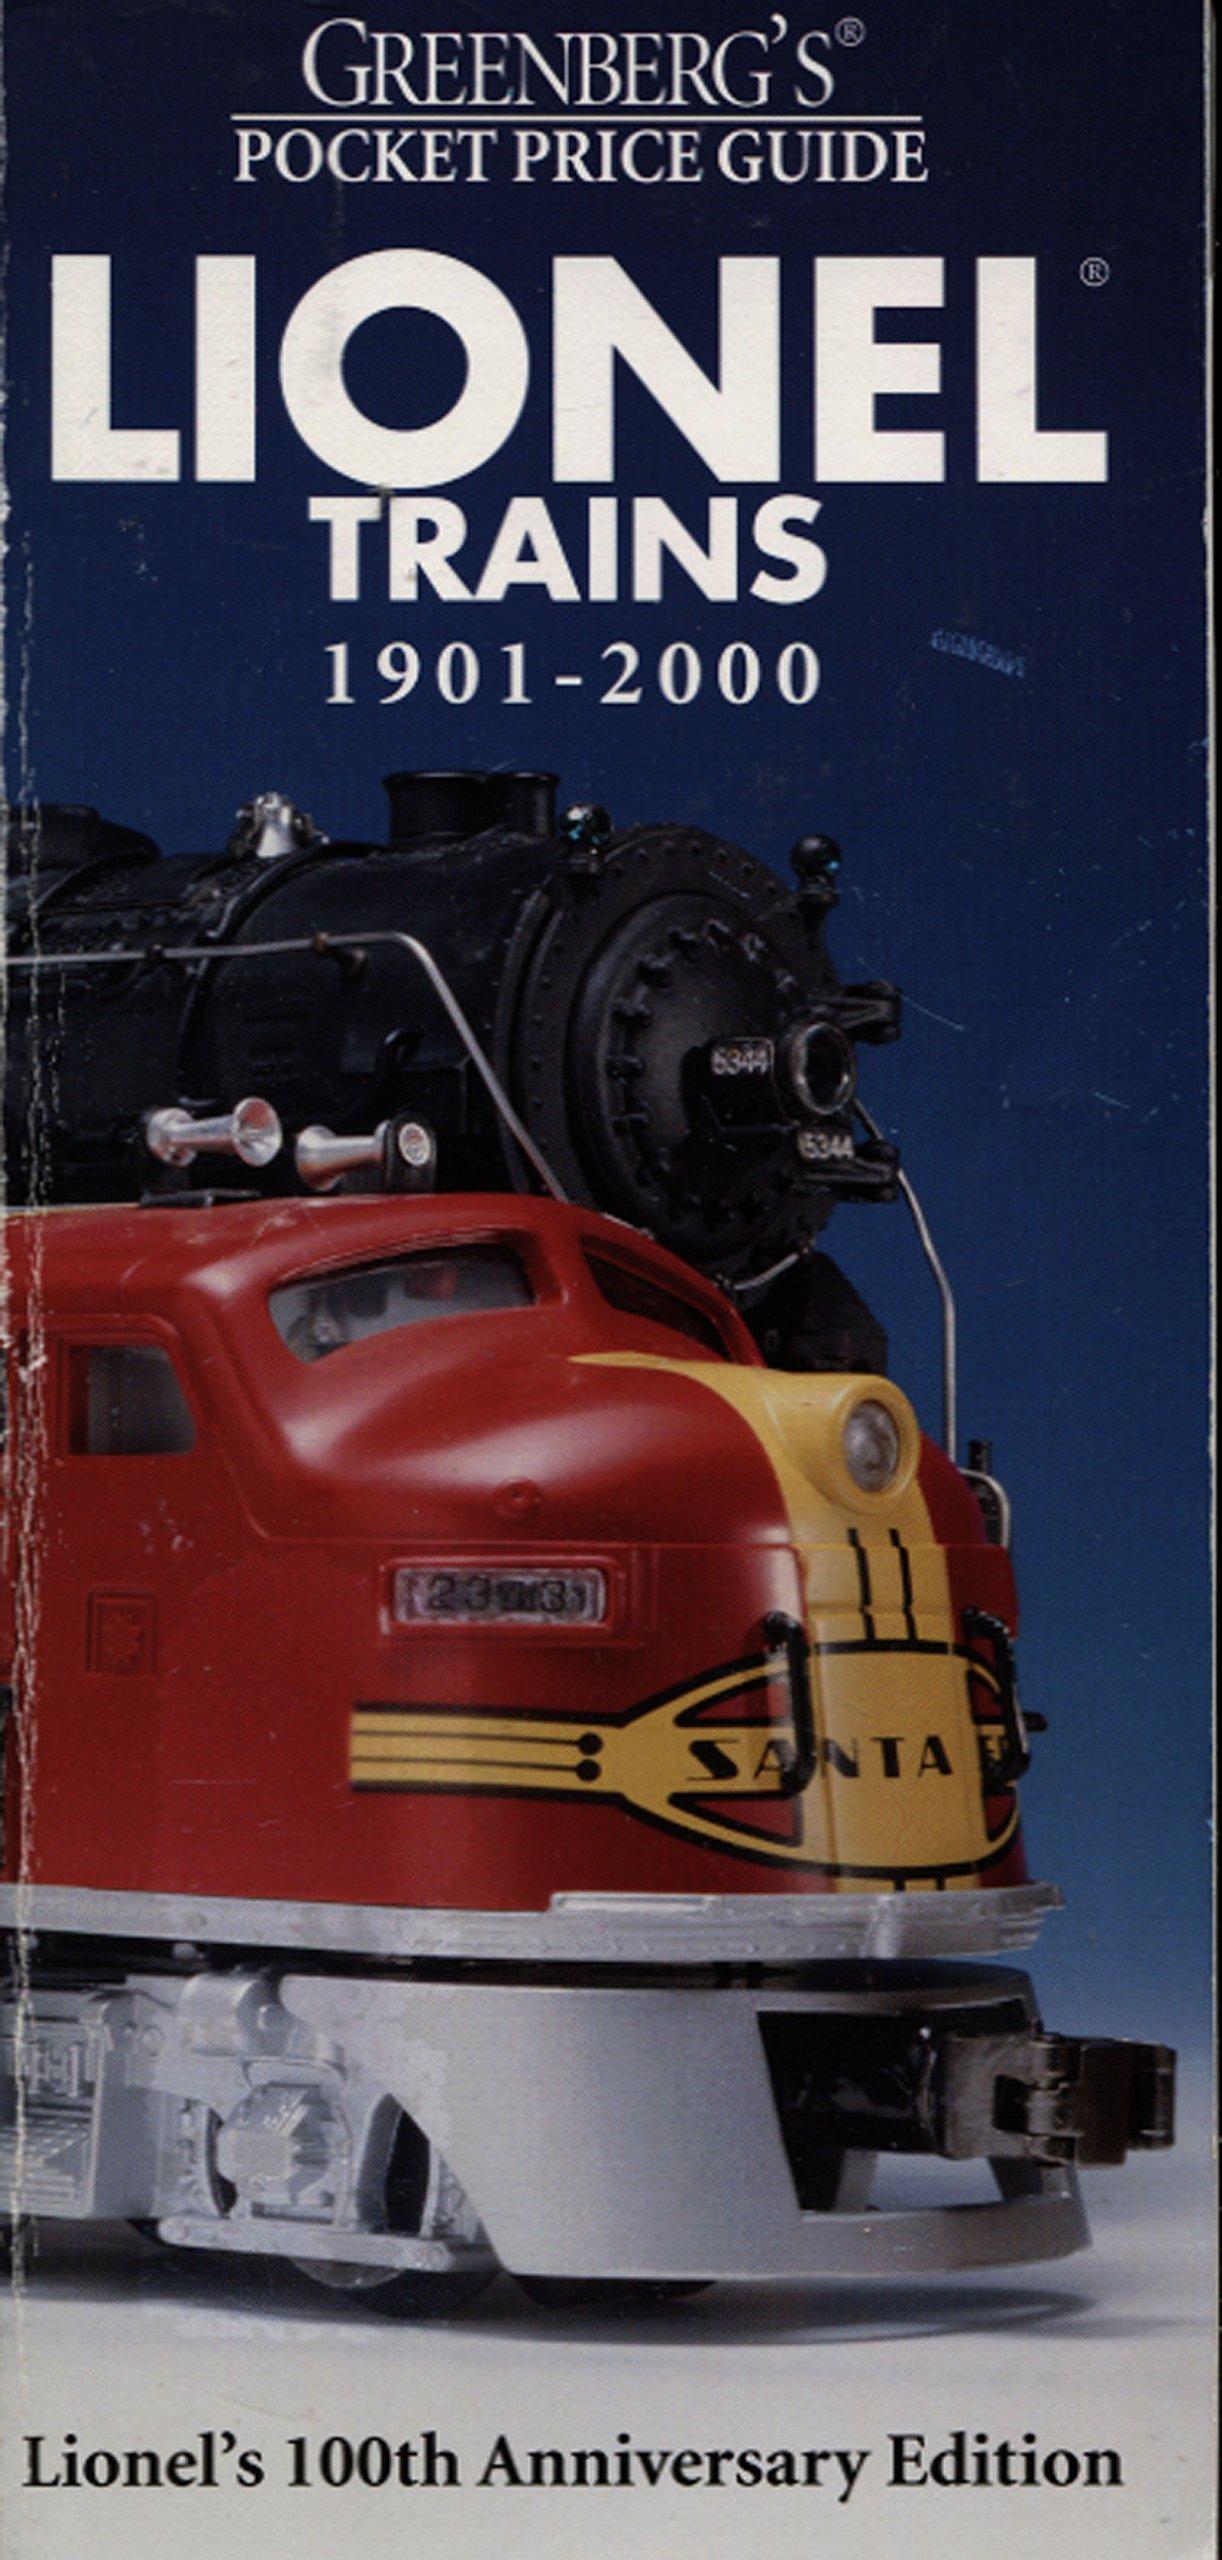 Greenberg's Pocket Price Guide: Lionel Trains 1901-2000 (Greenburg's Pocket Price Guide Lionel Trains)